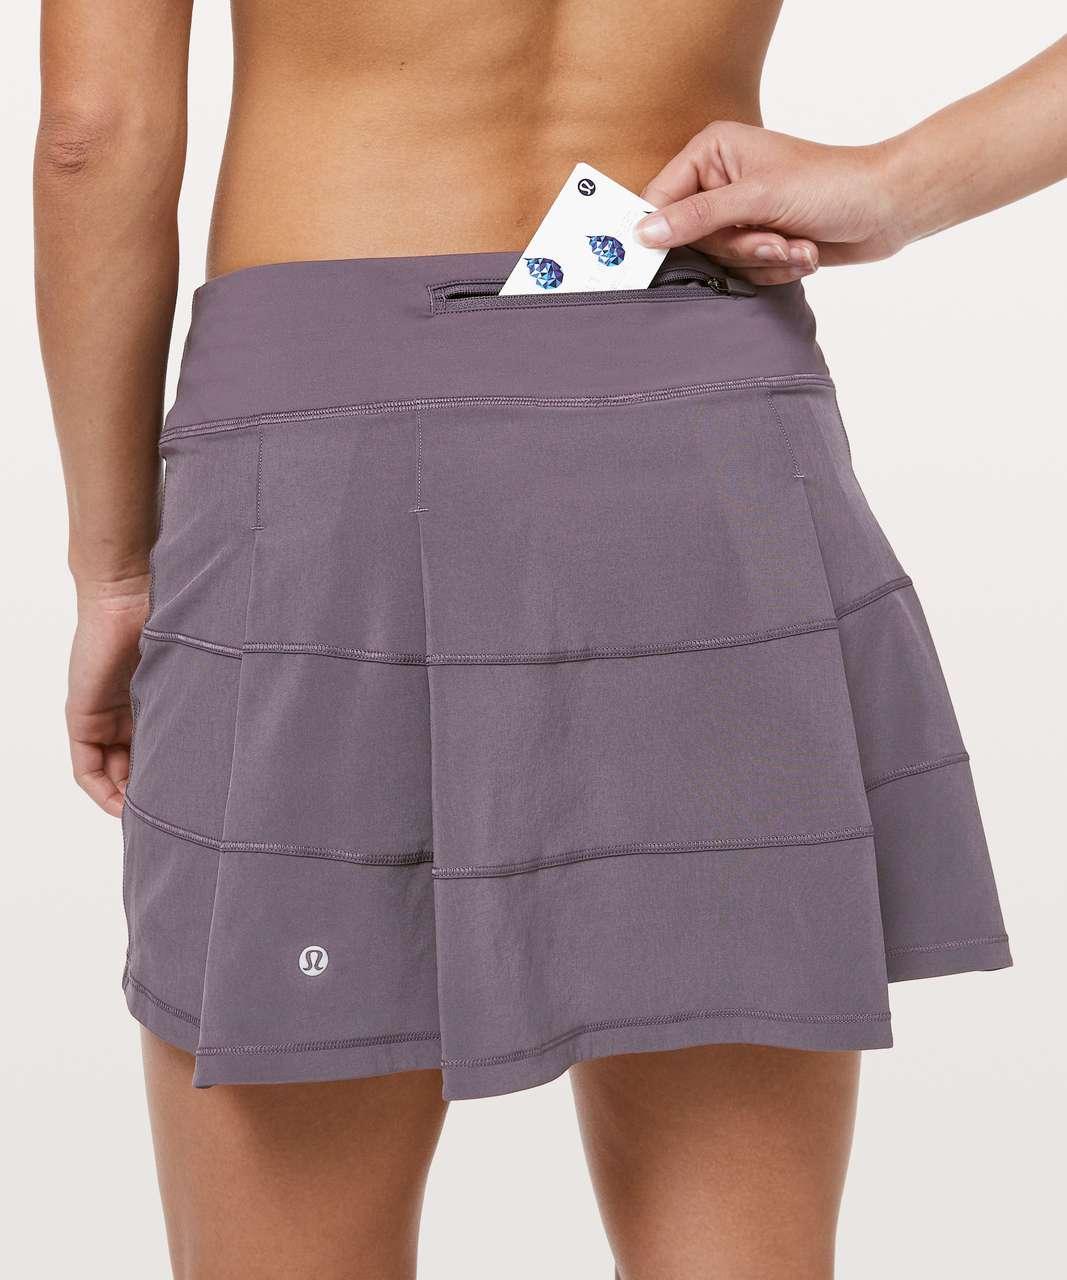 "Lululemon Pace Rival Skirt (Tall) *4-way Stretch 15"" - Graphite Purple"